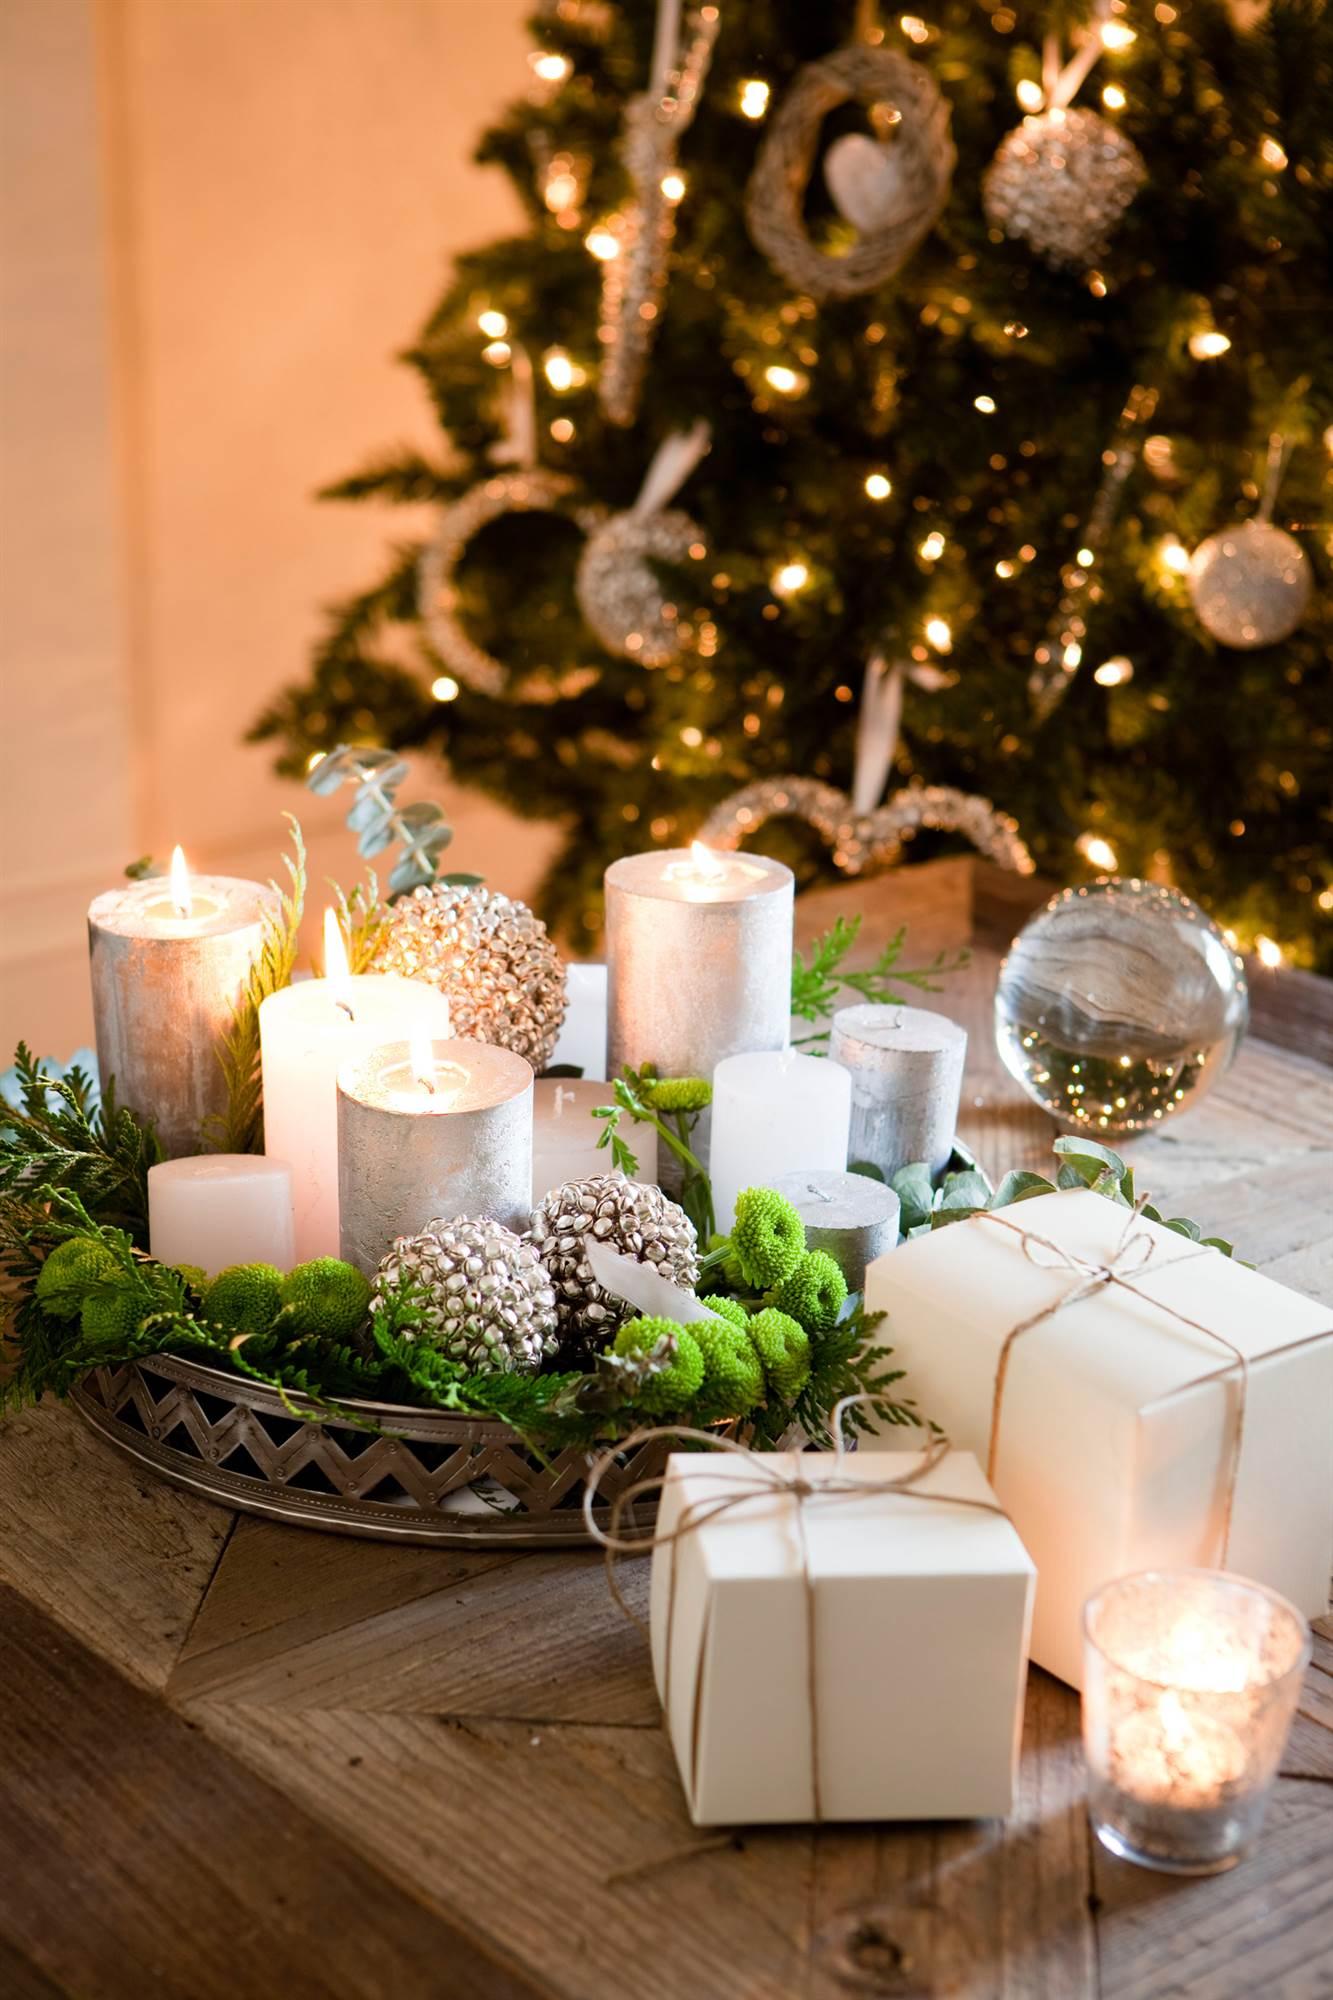 Prepara tu casa para esta navidad - Centros navidenos con velas ...